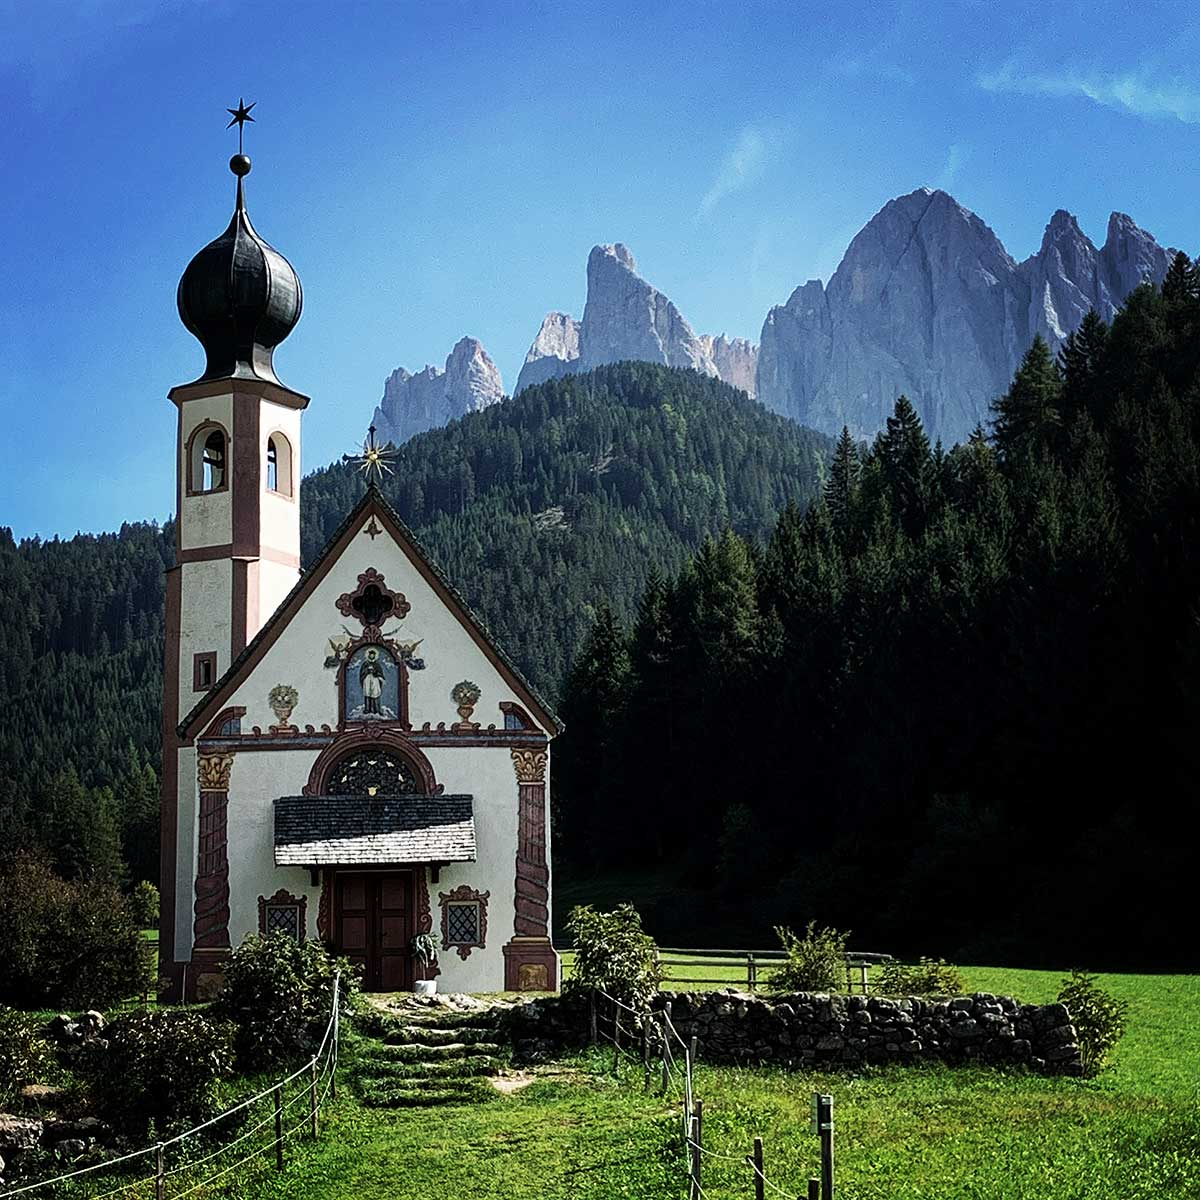 Saint Johann Chapel in Val di Funes, Italy